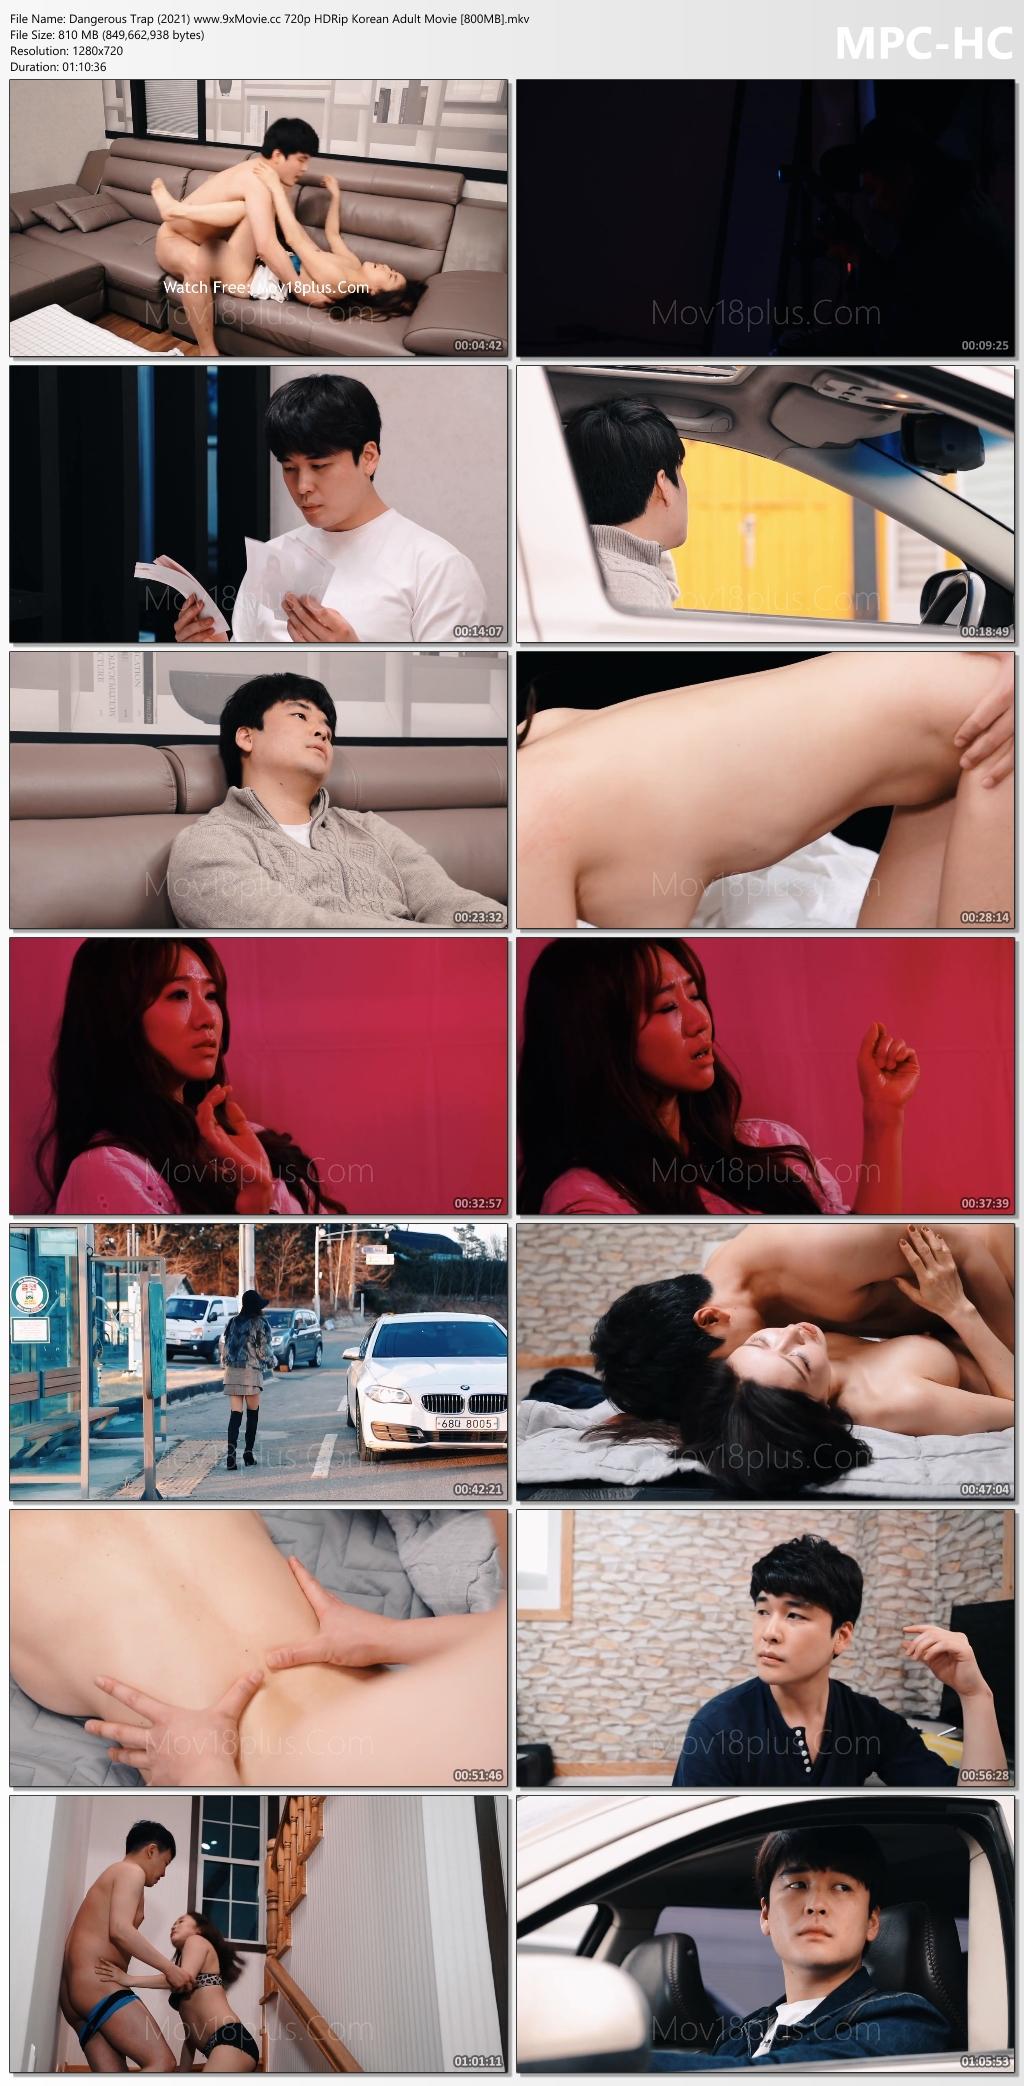 Dangerous-Trap-2021-www-9x-Movie-cc-720p-HDRip-Korean-Adult-Movie-800-MB-mkv